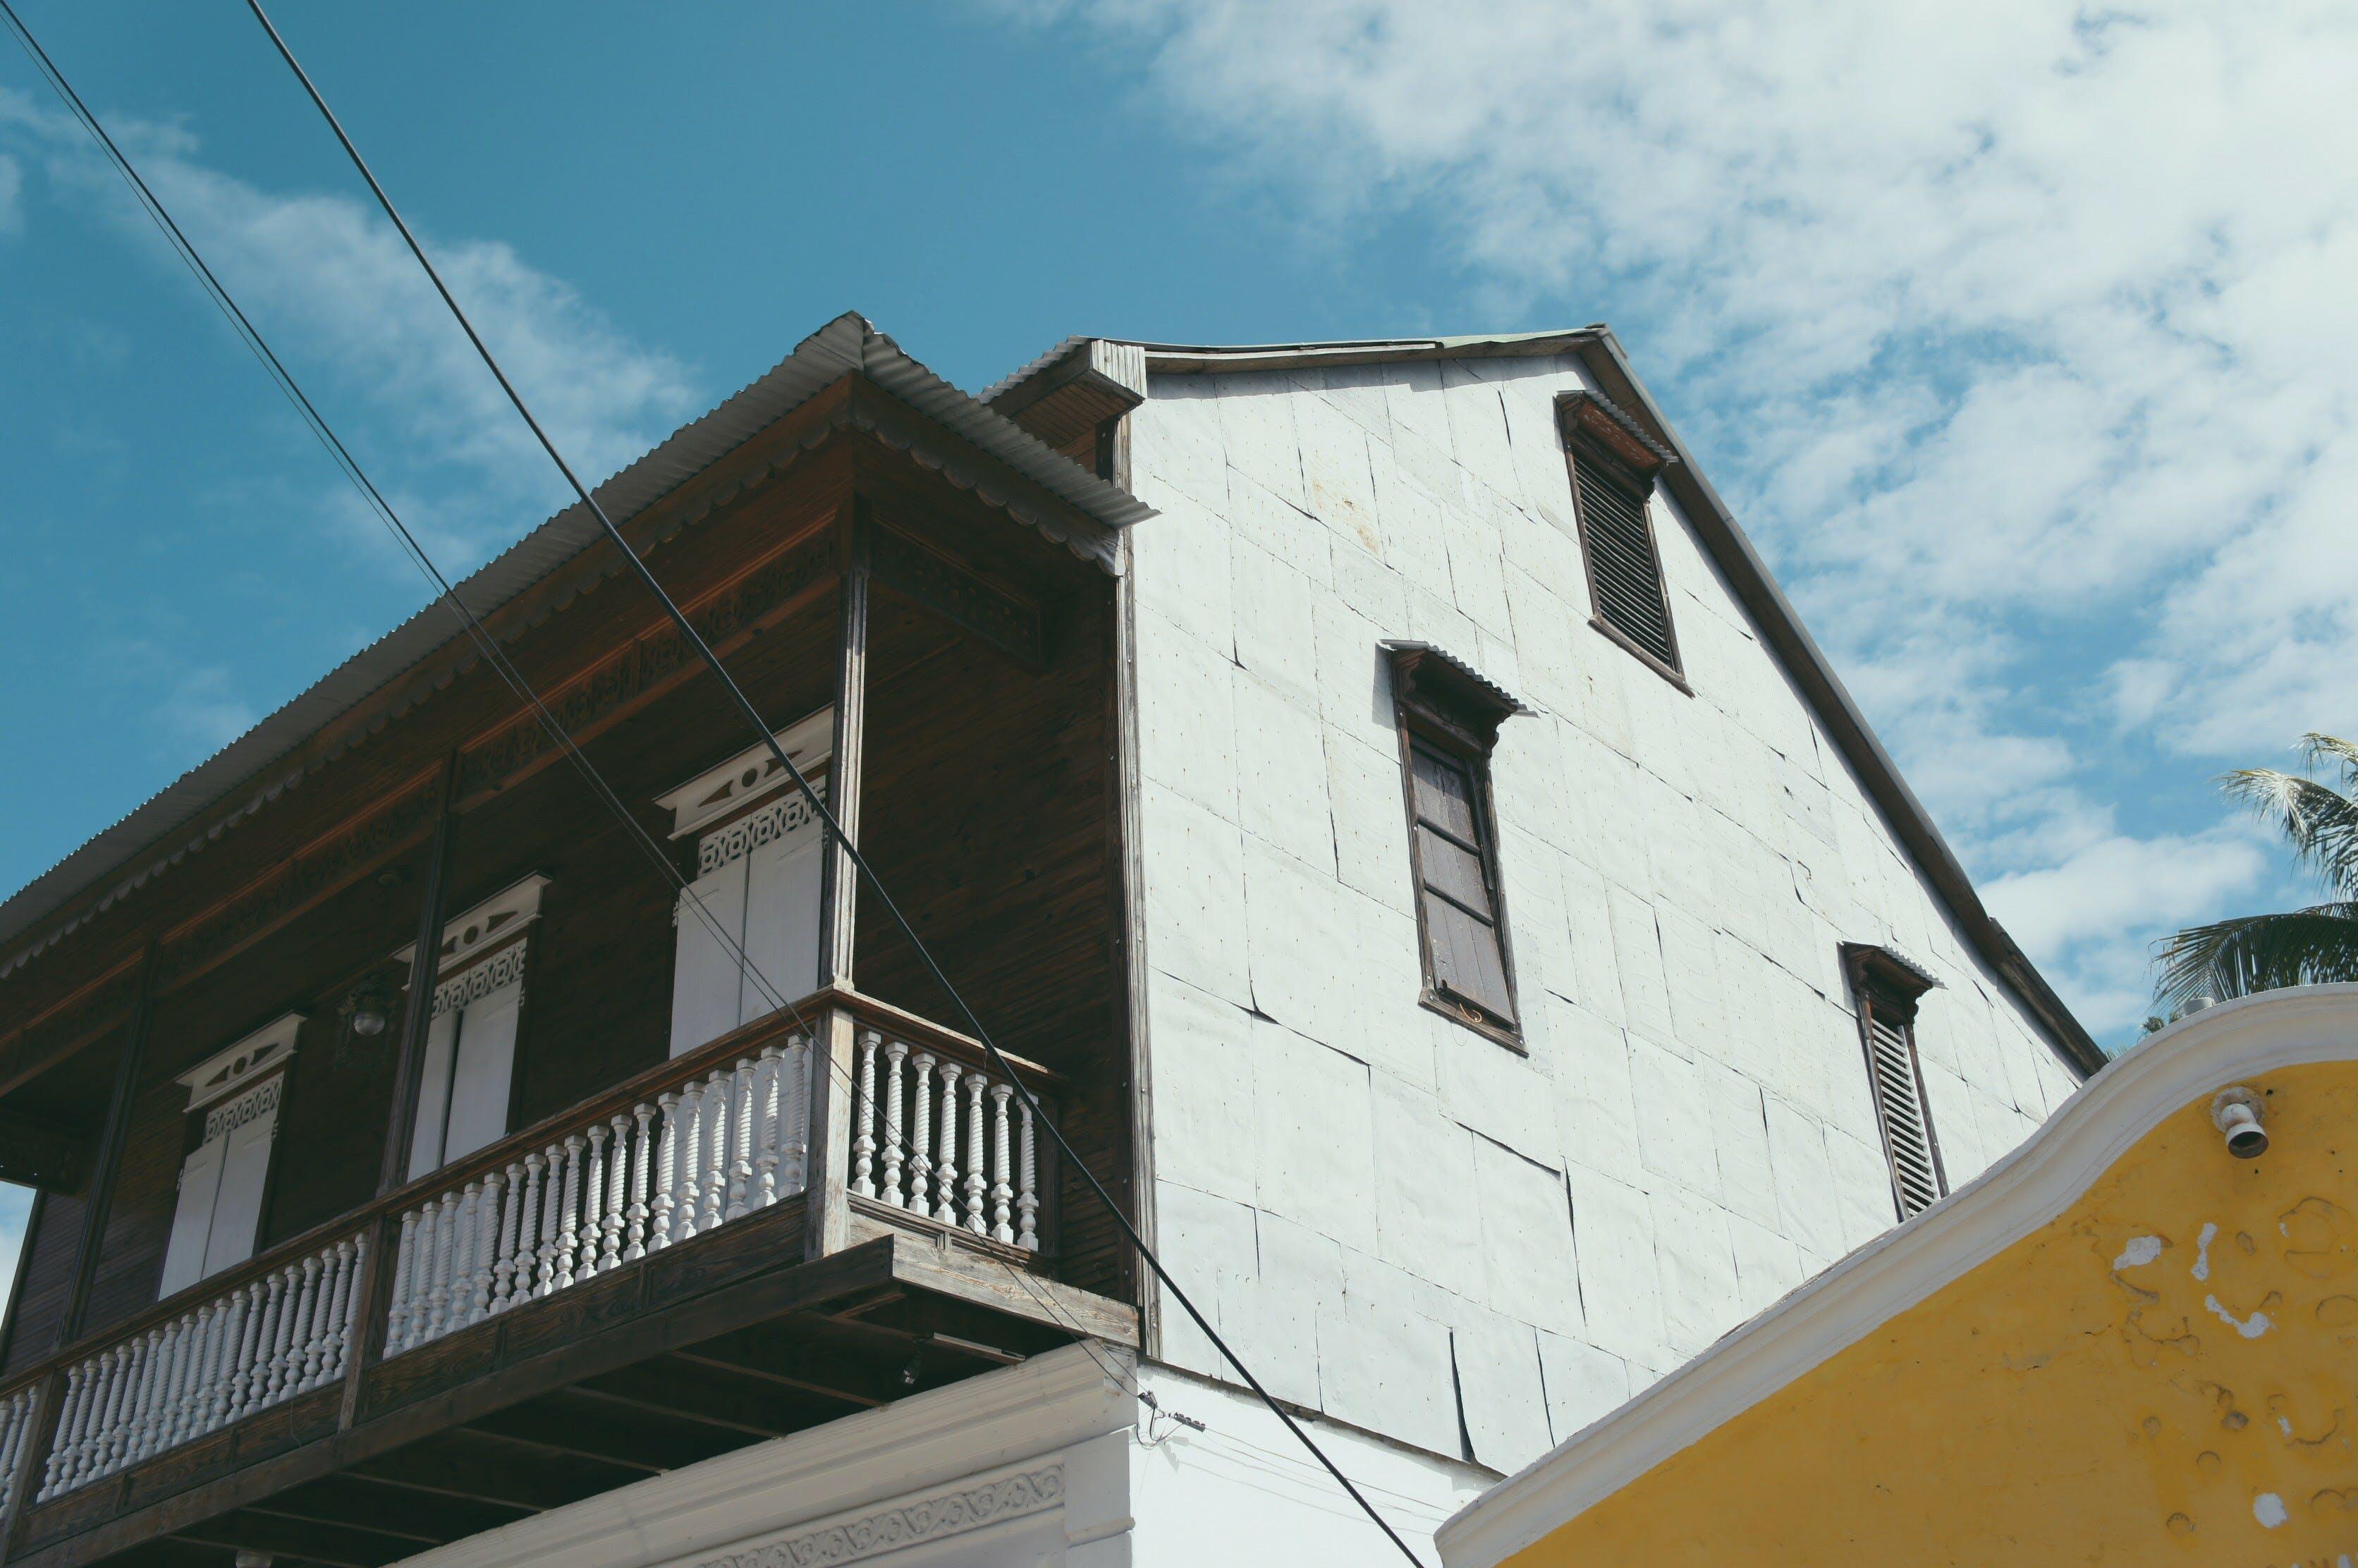 White and Black Concrete 2-storey House Under Blue Sky